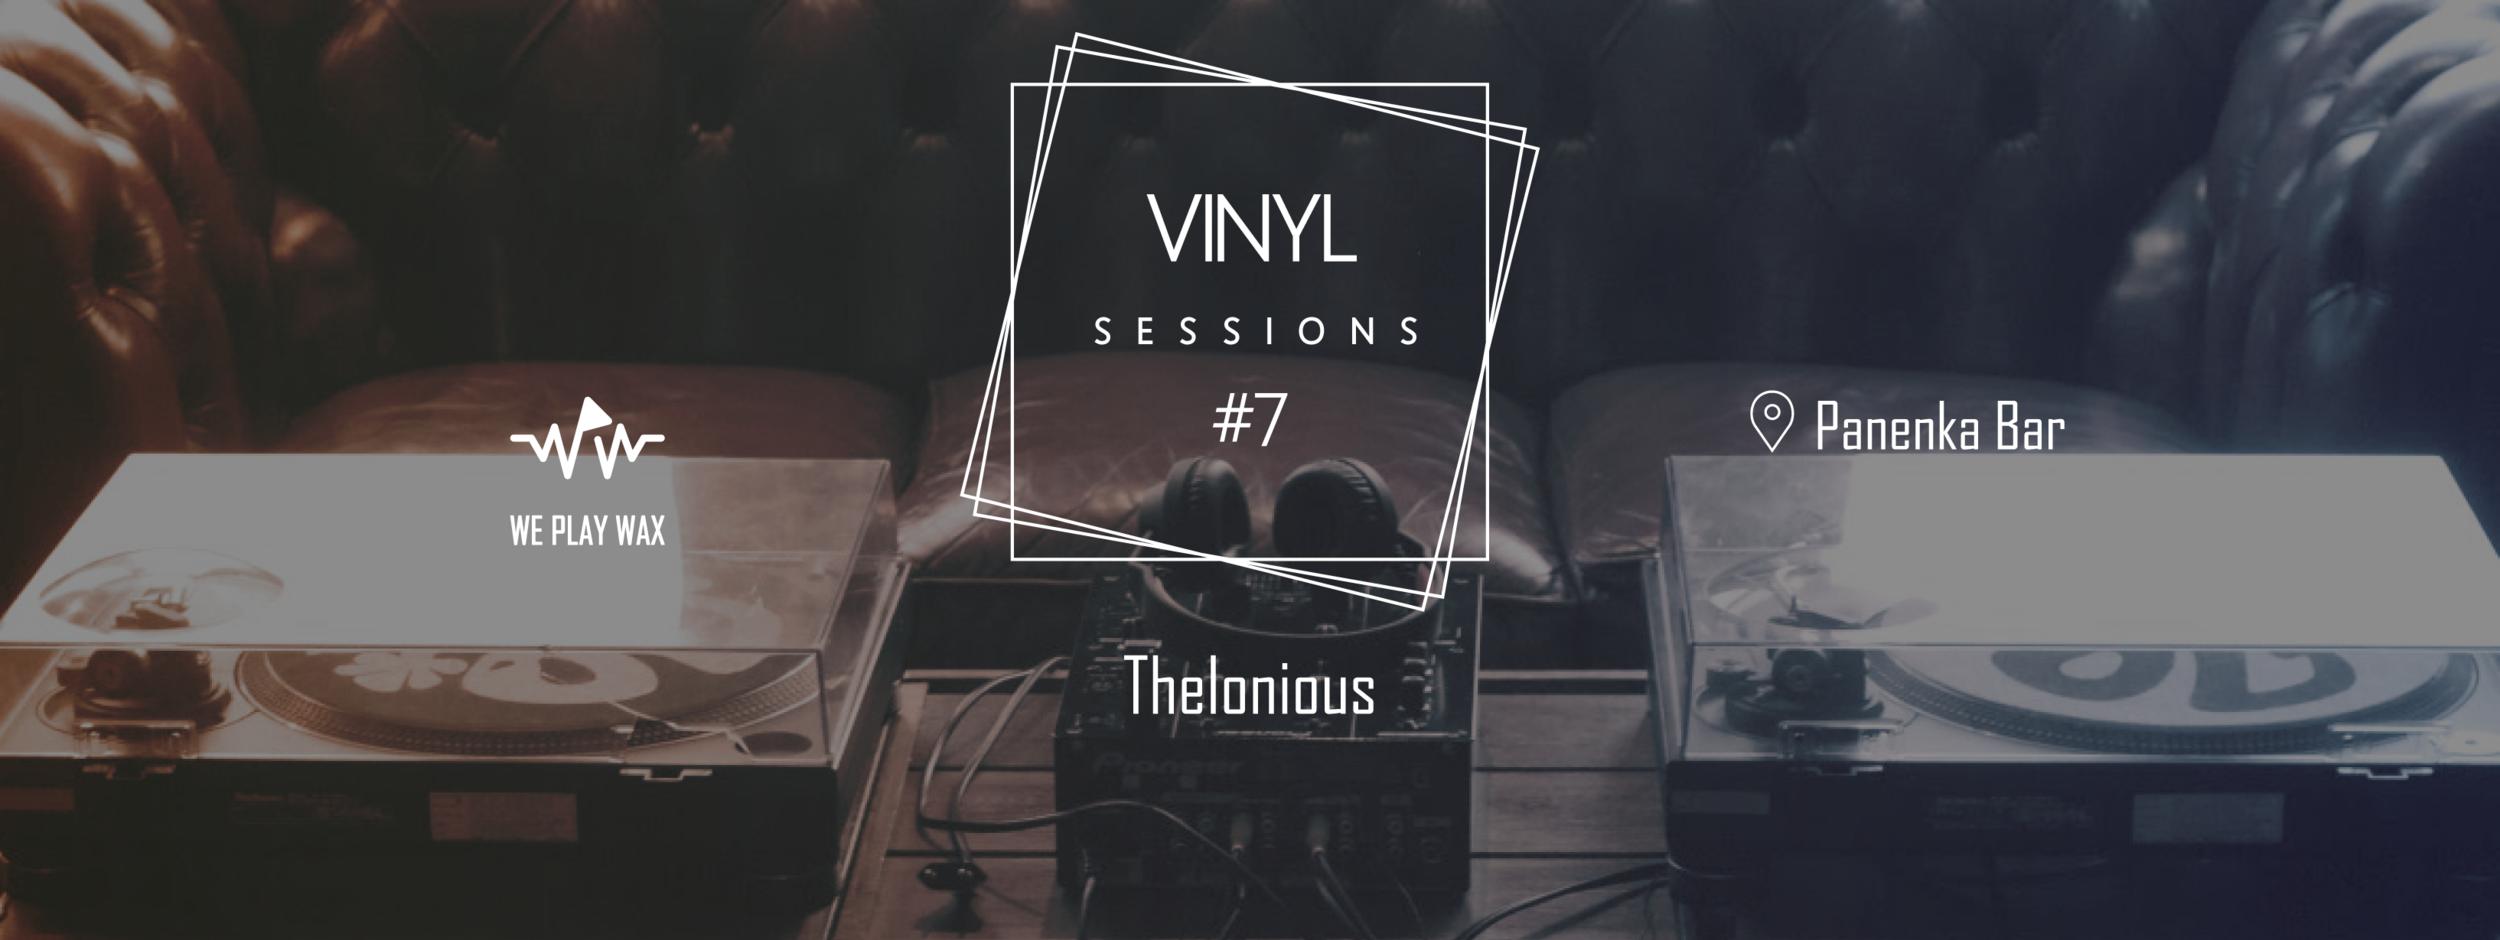 Vinyl Sessions #07 - Thelonious